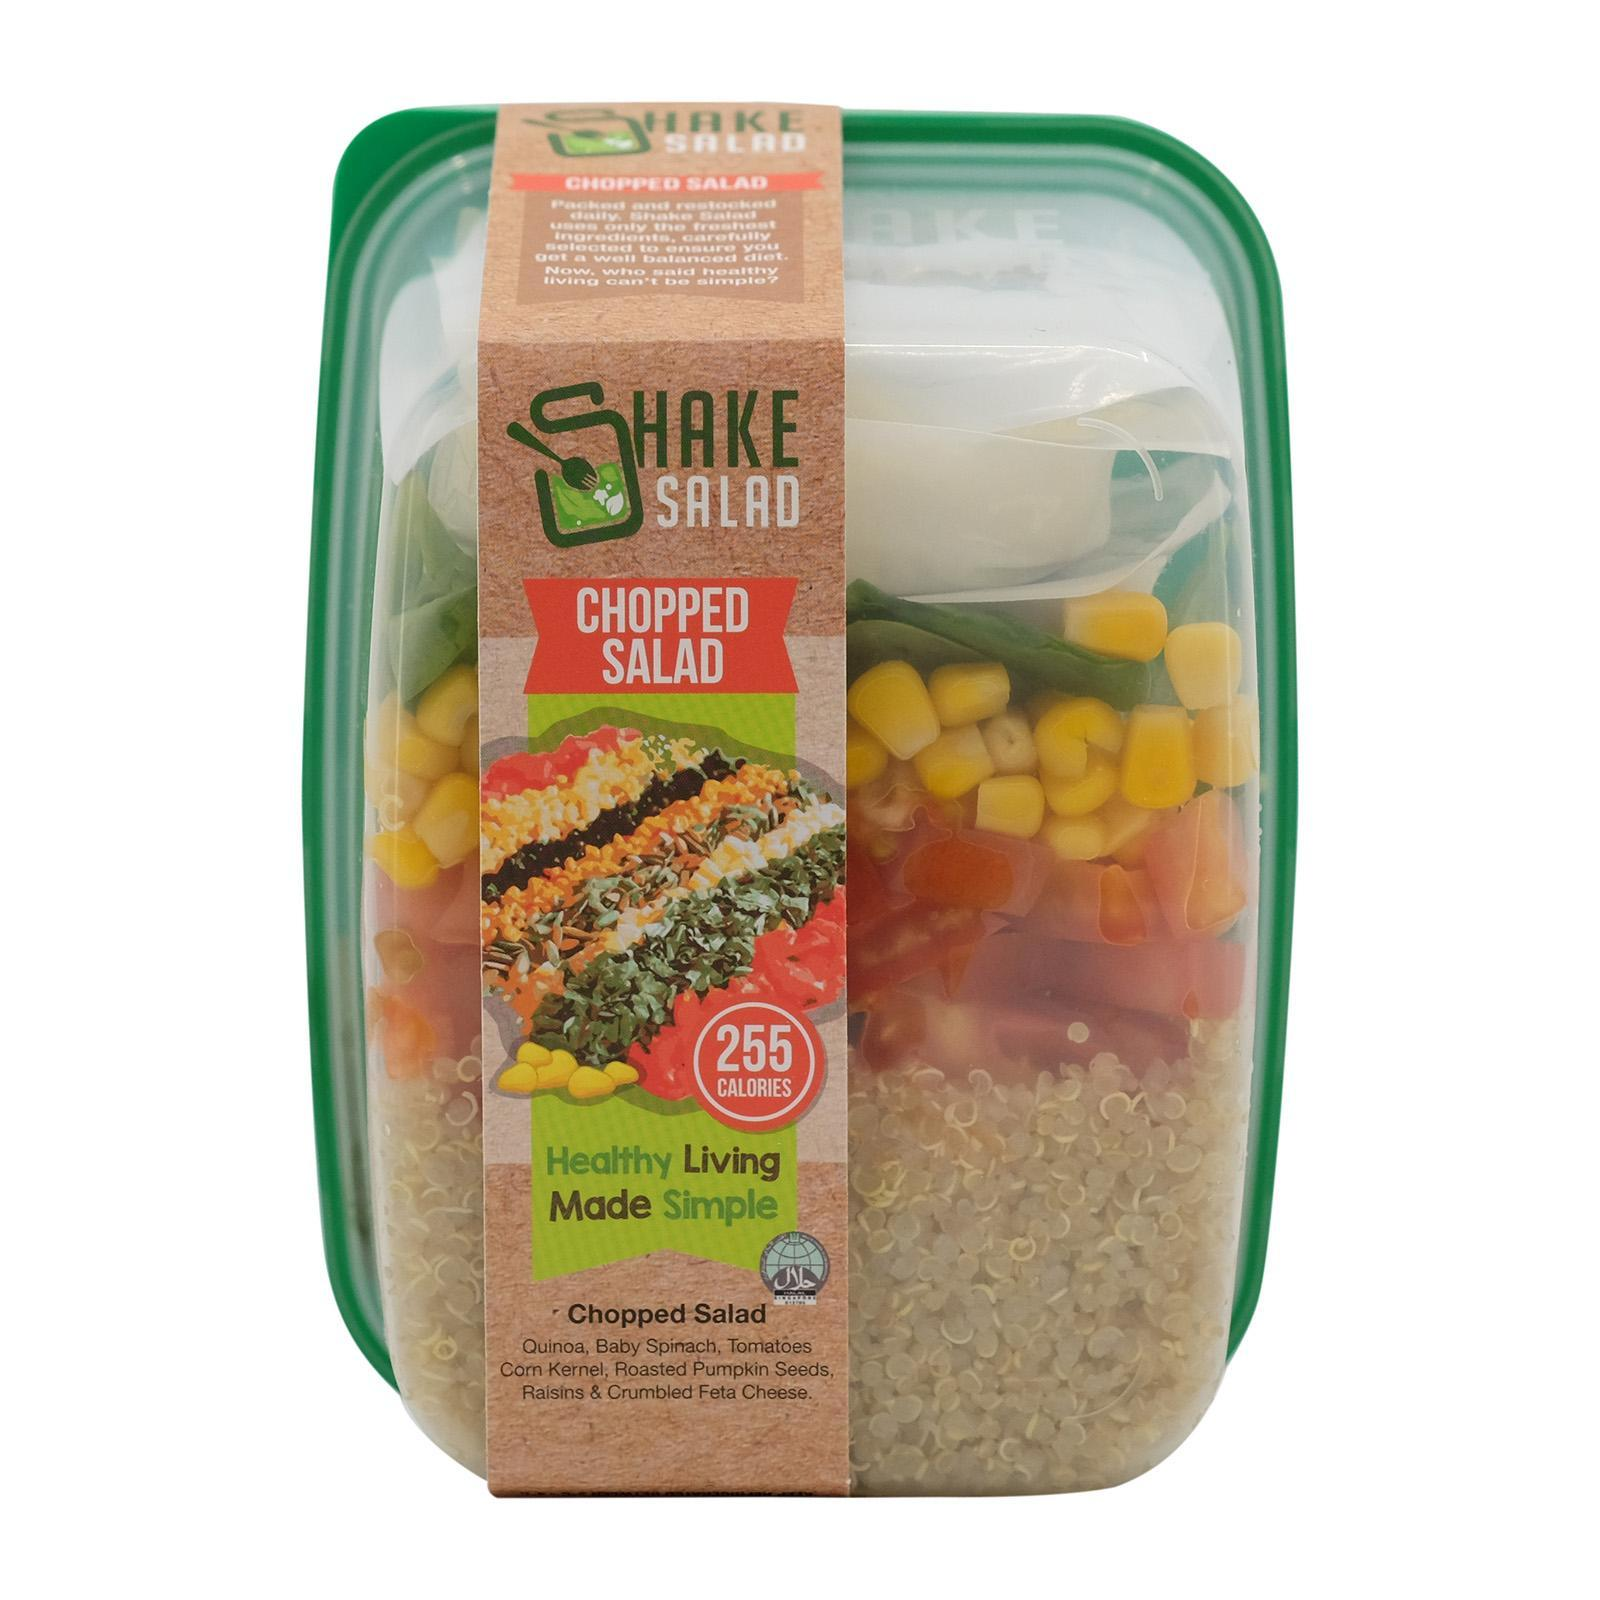 Shake Salad Chopped Salad